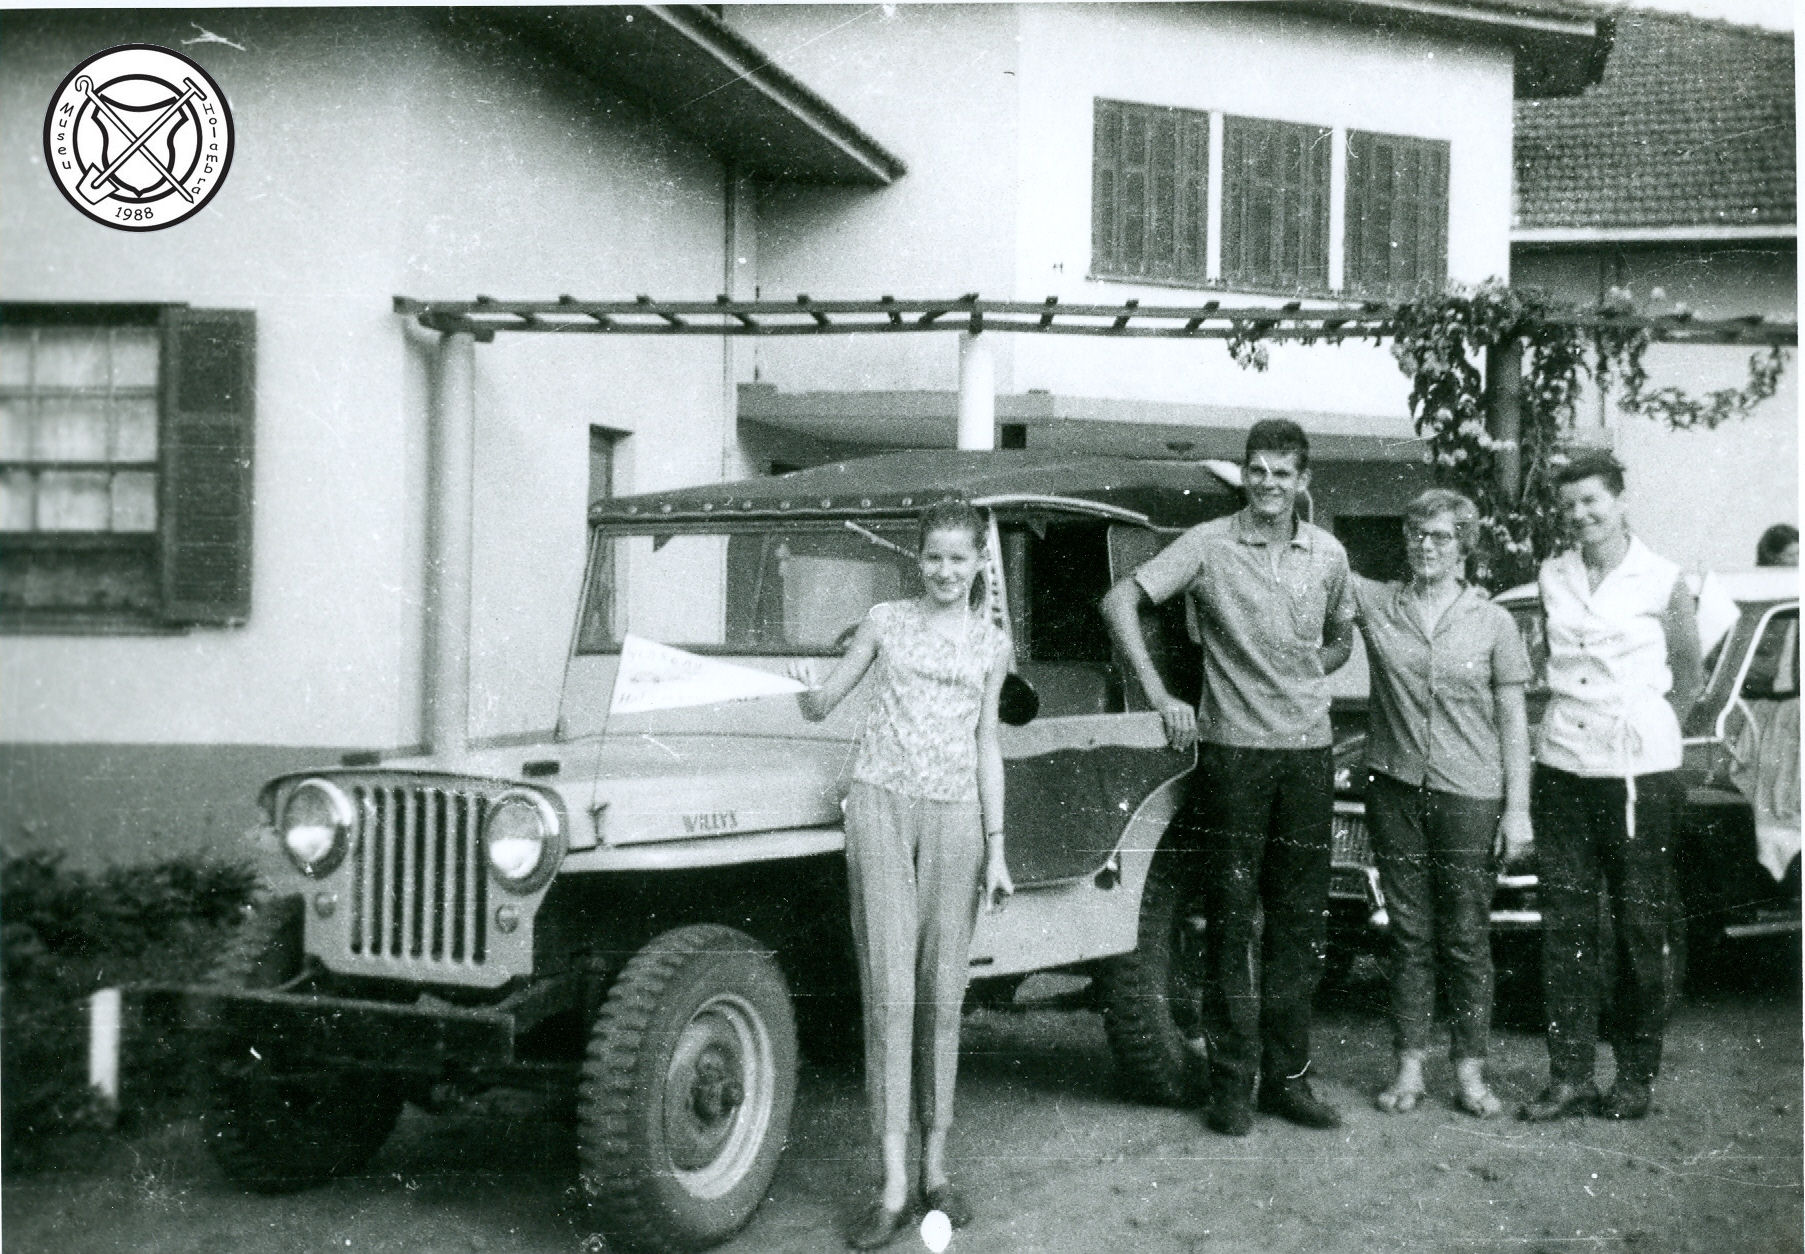 Puzzeltocht van 1969